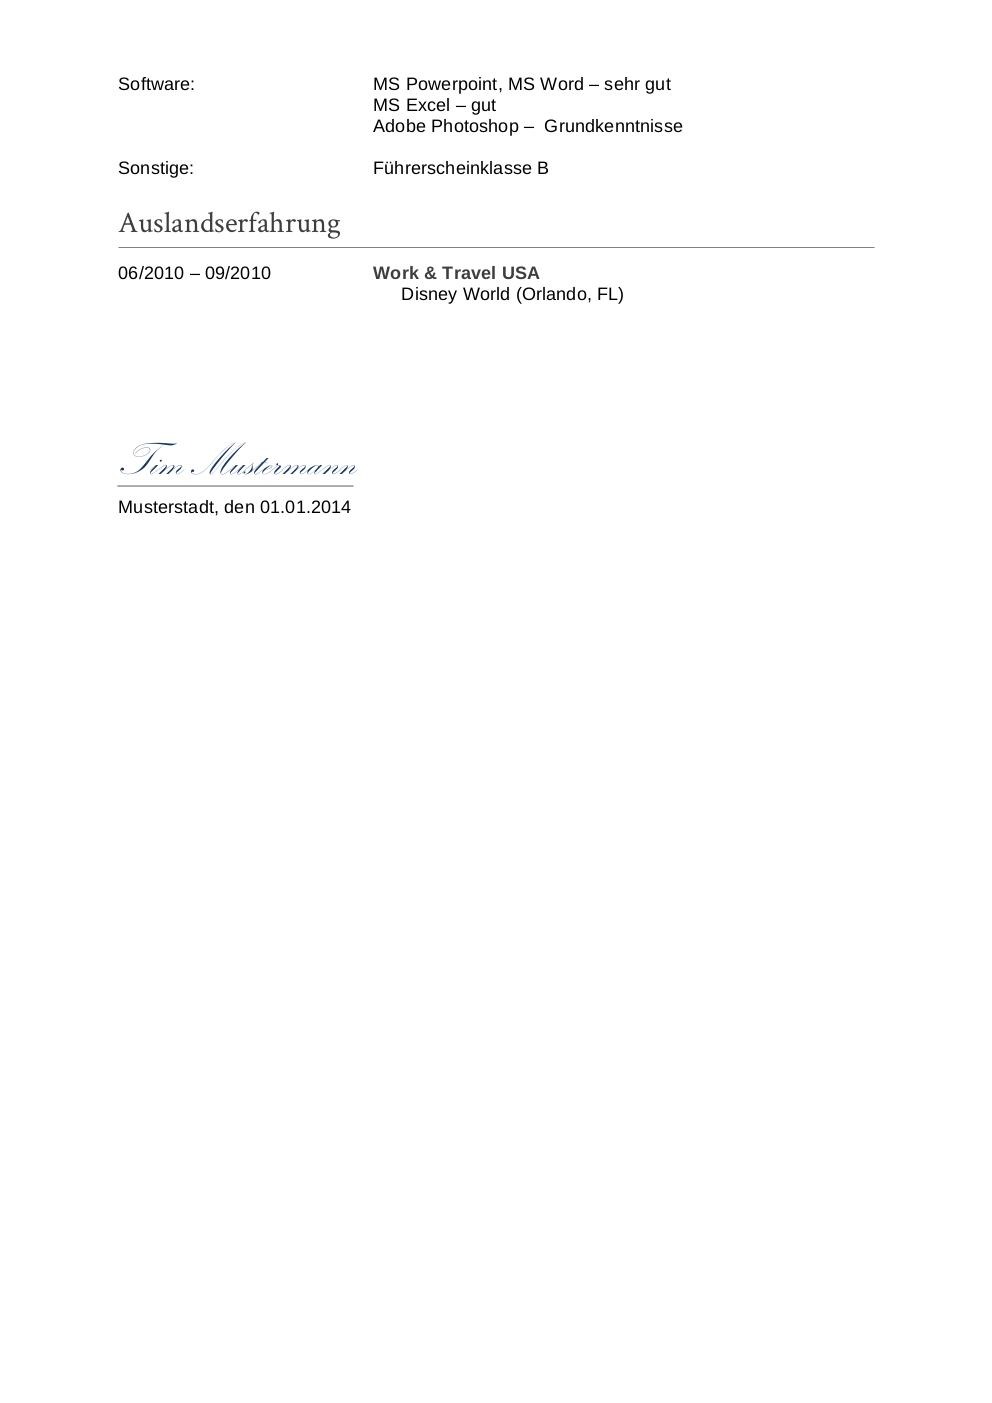 Charmant Lebenslauf Sachbearbeiter Galerie - Entry Level Resume ...